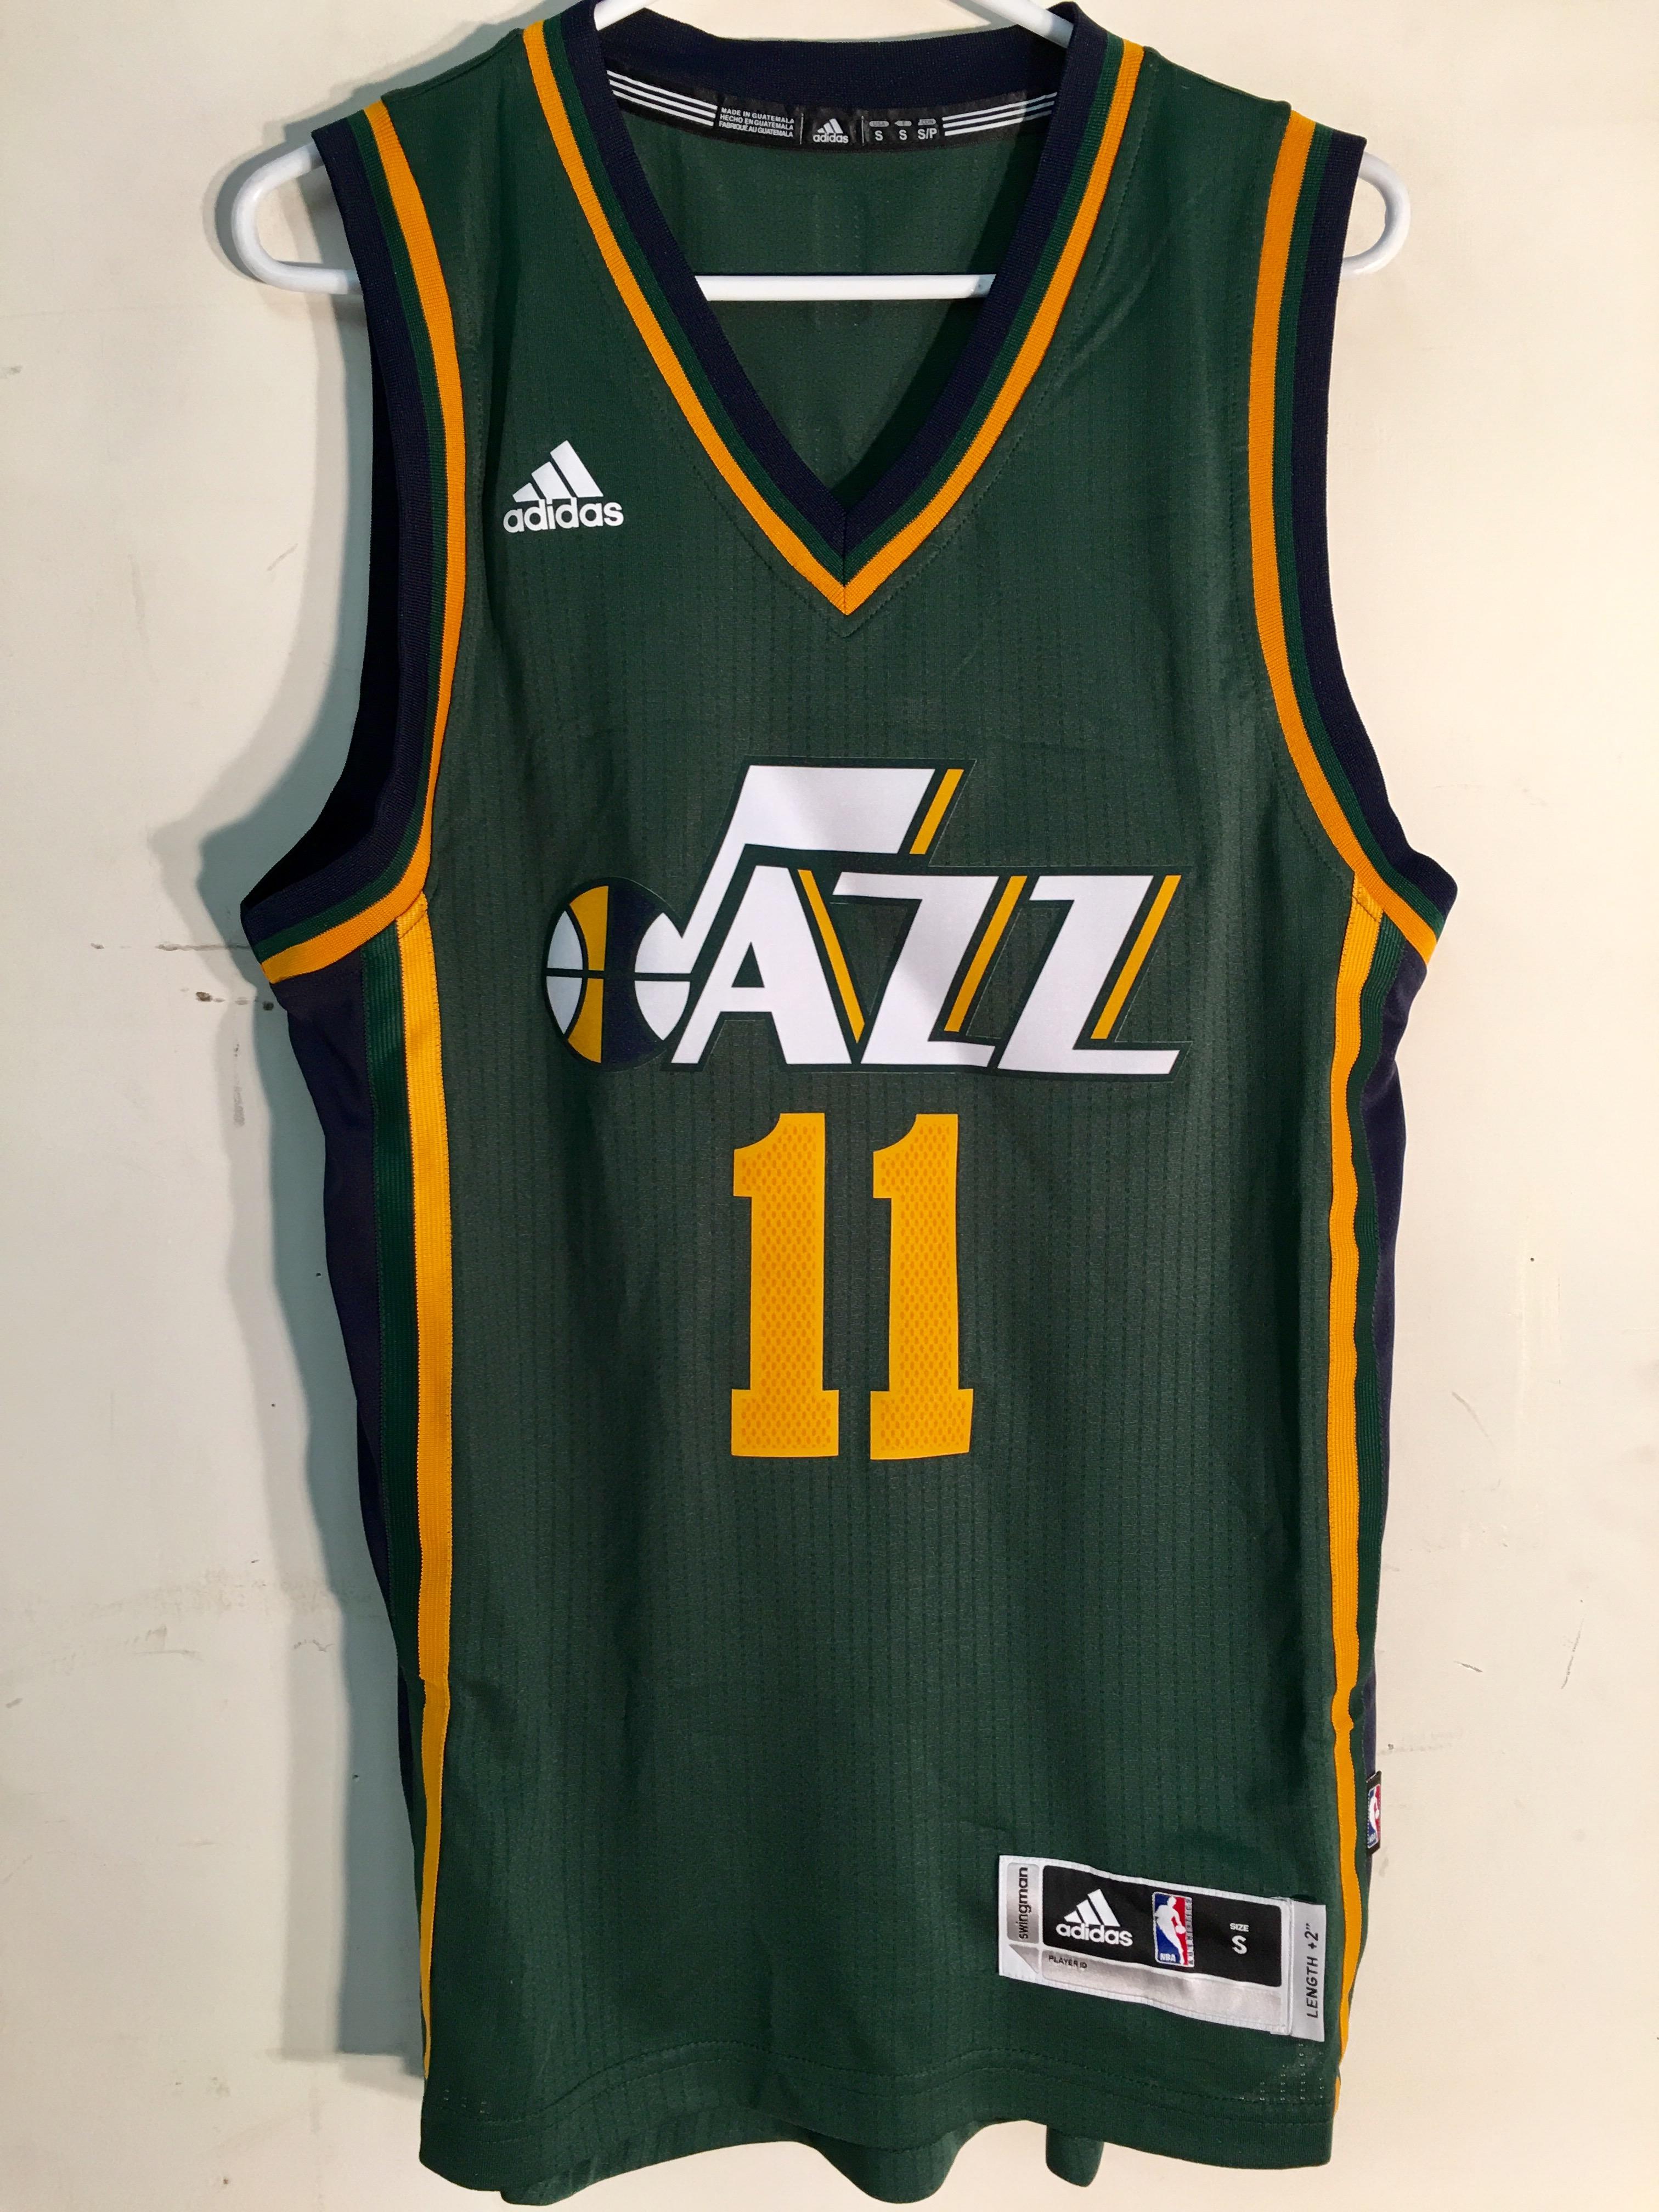 7e8574878 Adidas Swingman 2015-16 NBA Jersey Utah Jazz Dante Exum Green sz L ...